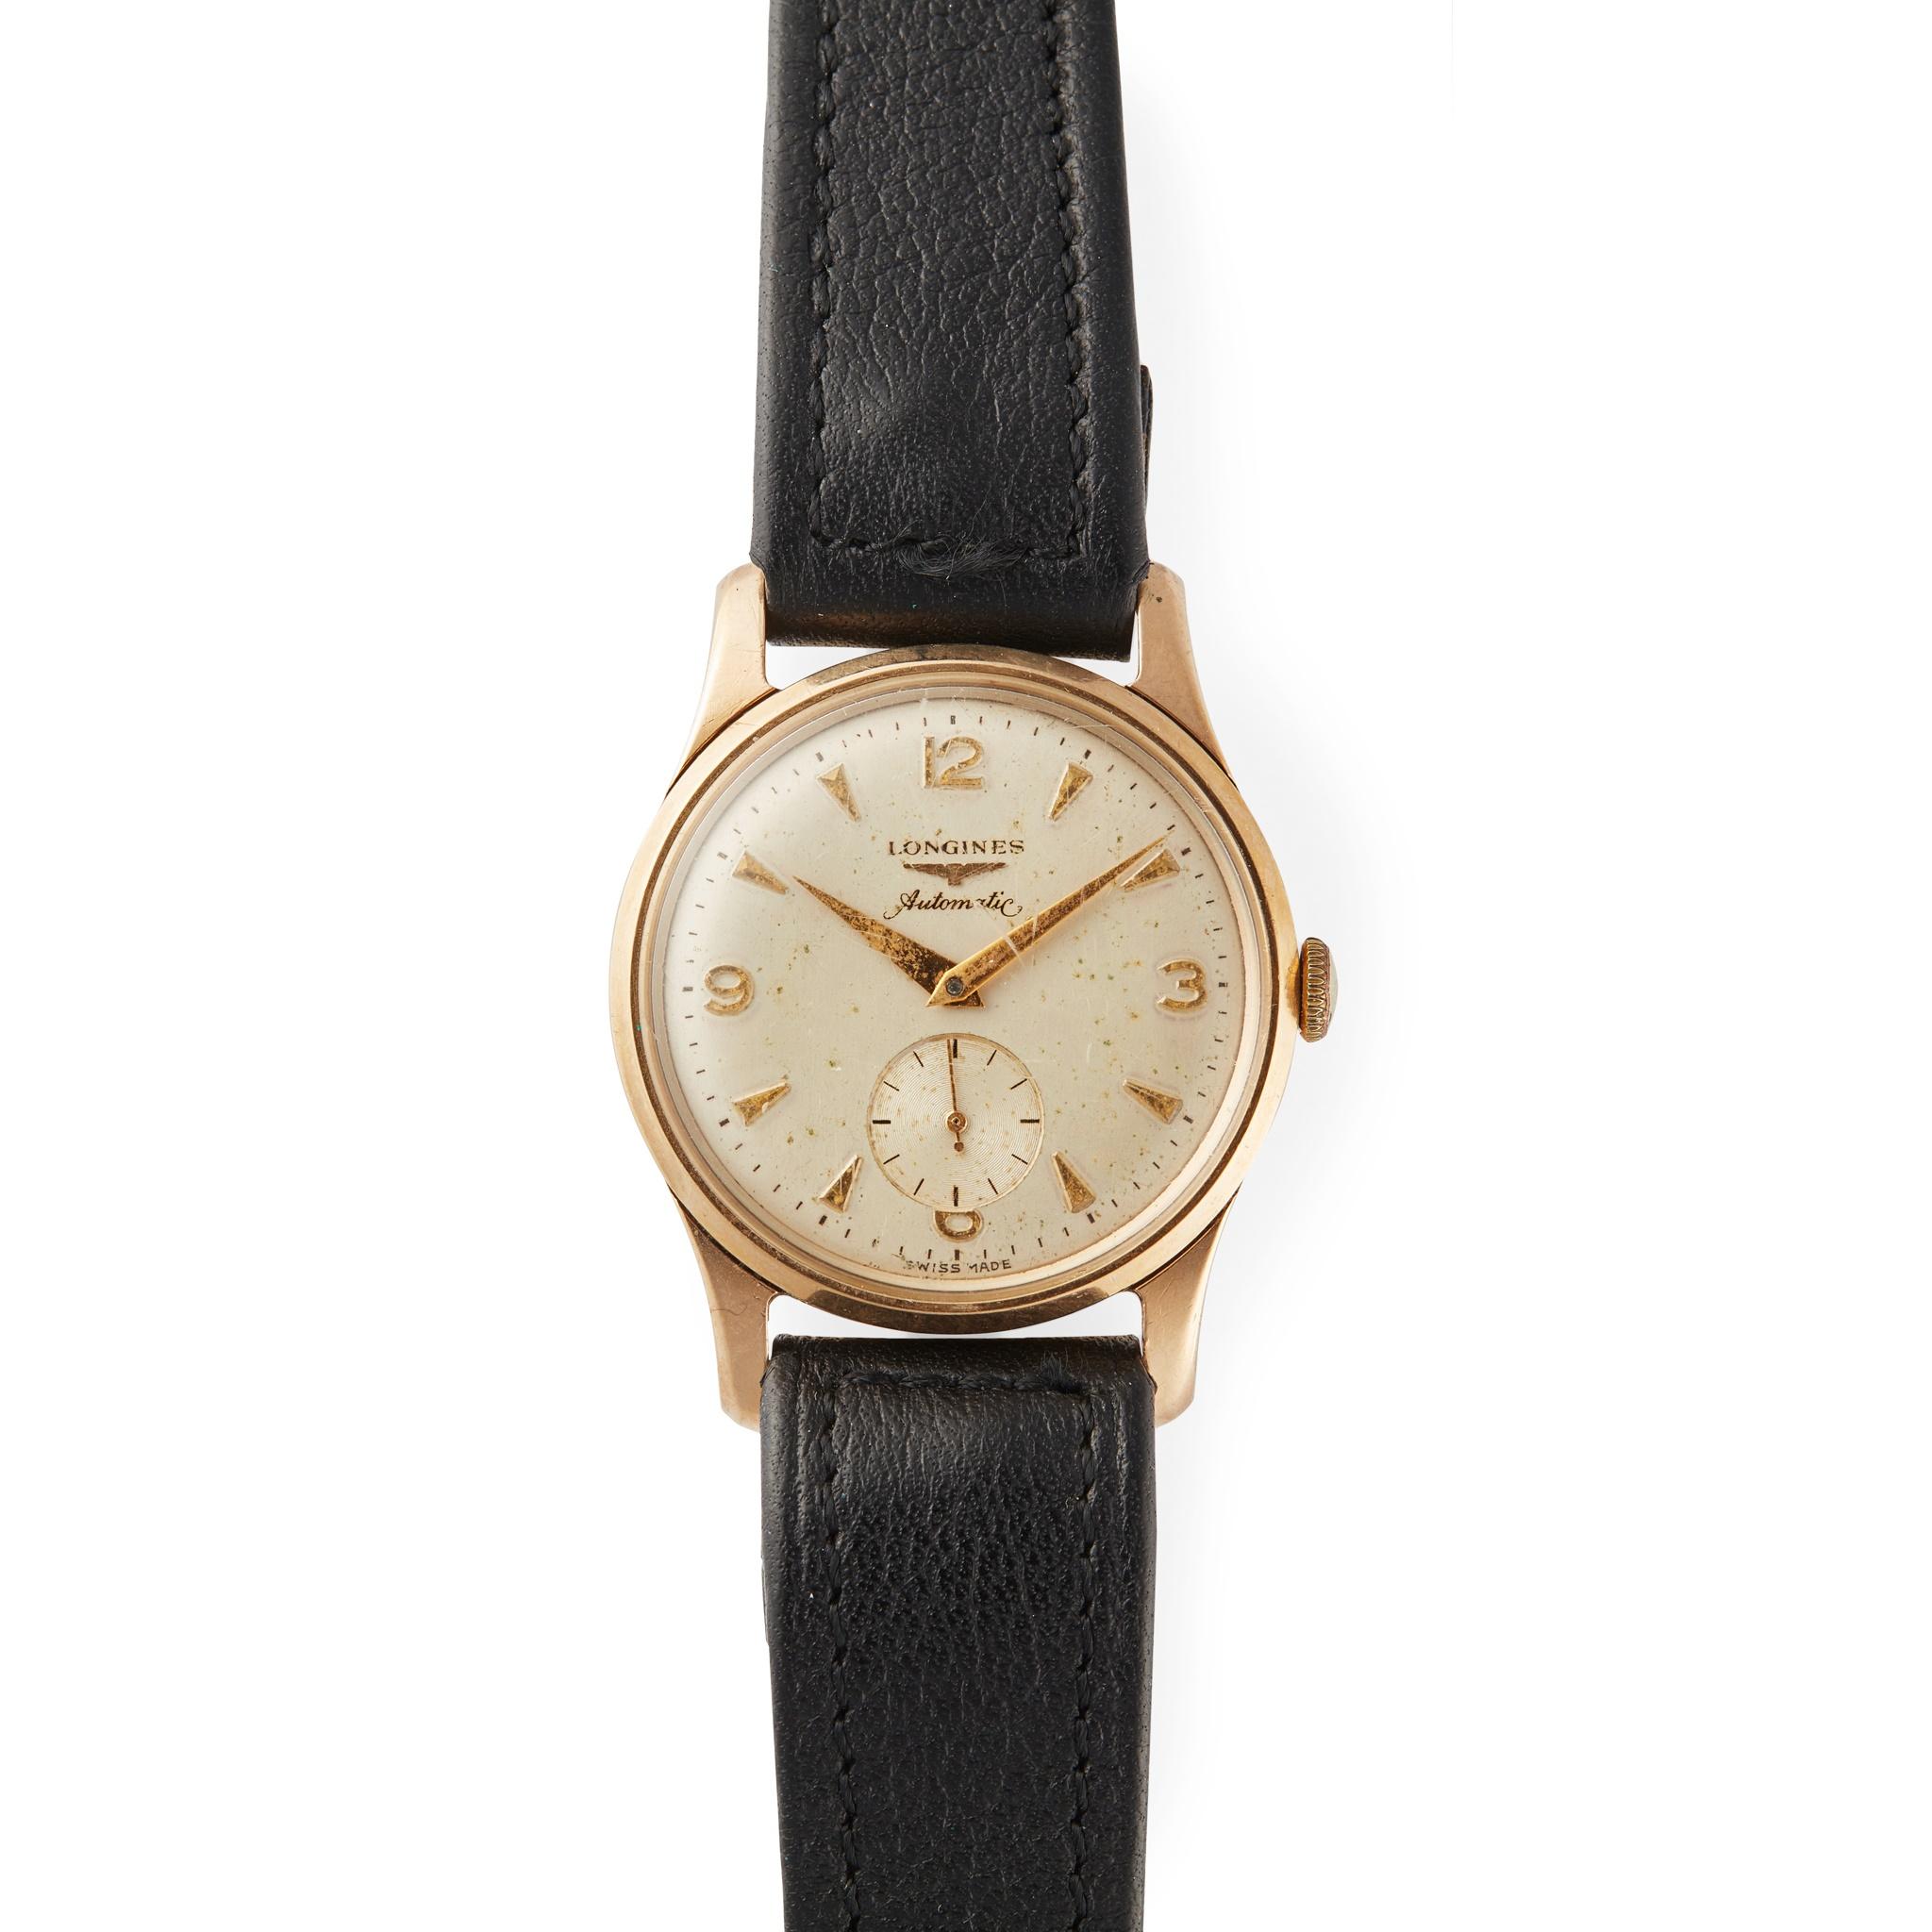 Longines: a gentleman's gold wrist watch